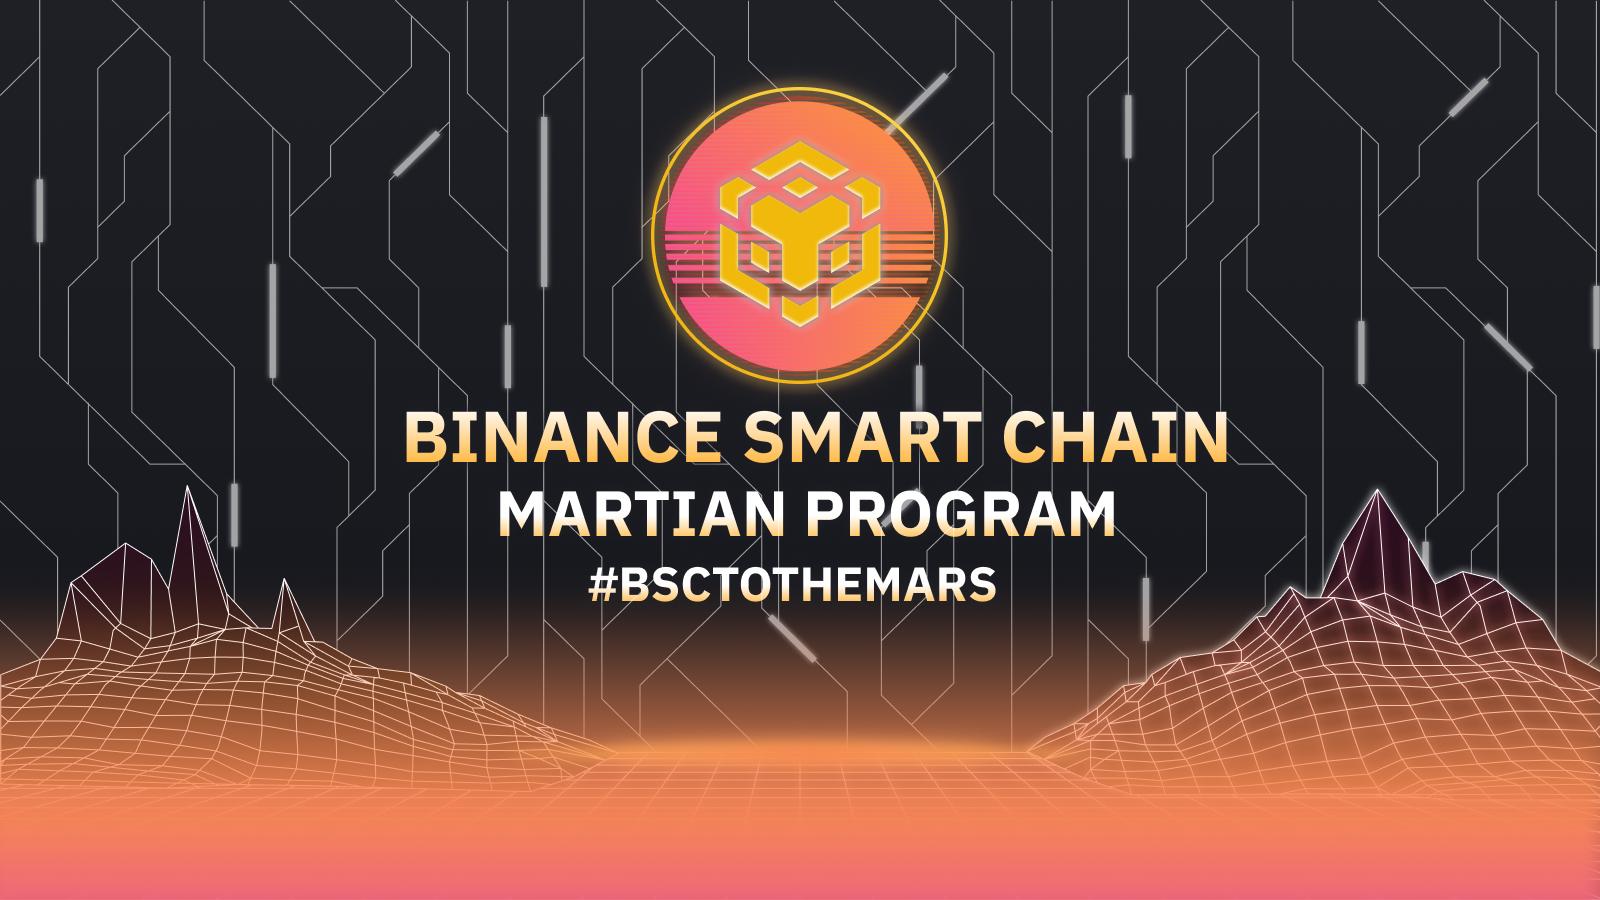 Introducing Binance Smart Chain Martian Program